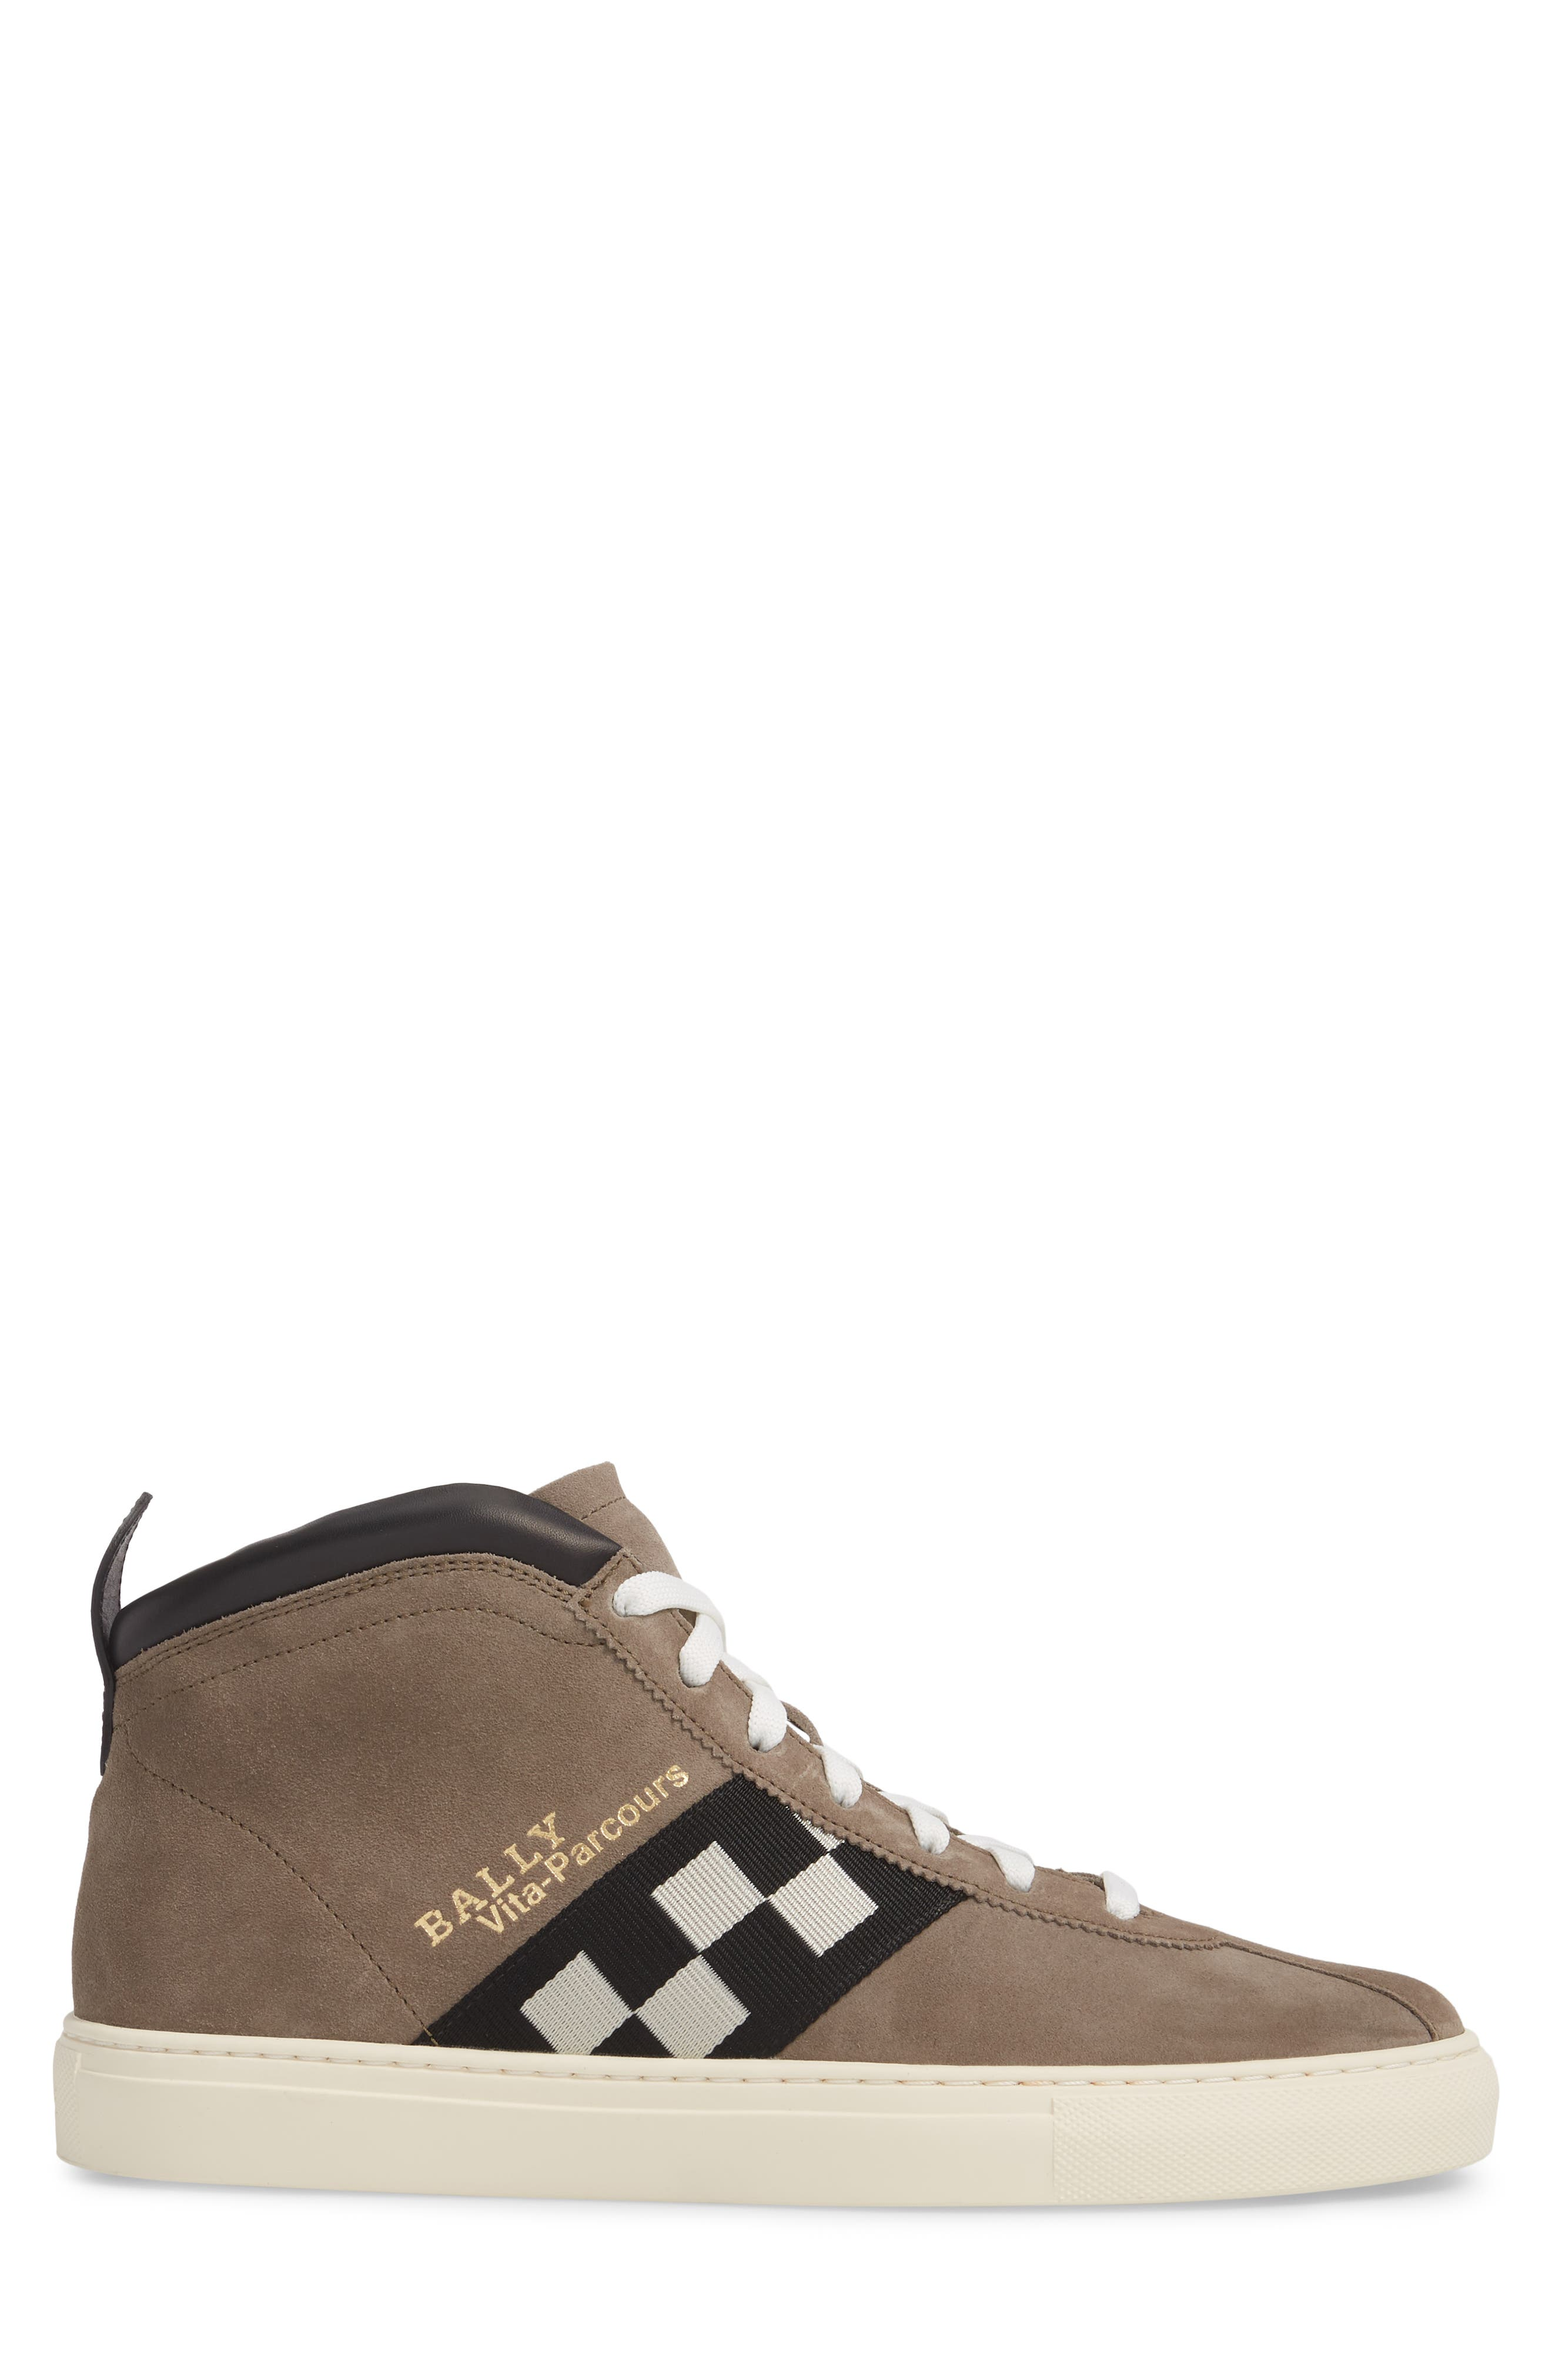 Vita Checkered High Top Sneaker,                             Alternate thumbnail 3, color,                             Snuff